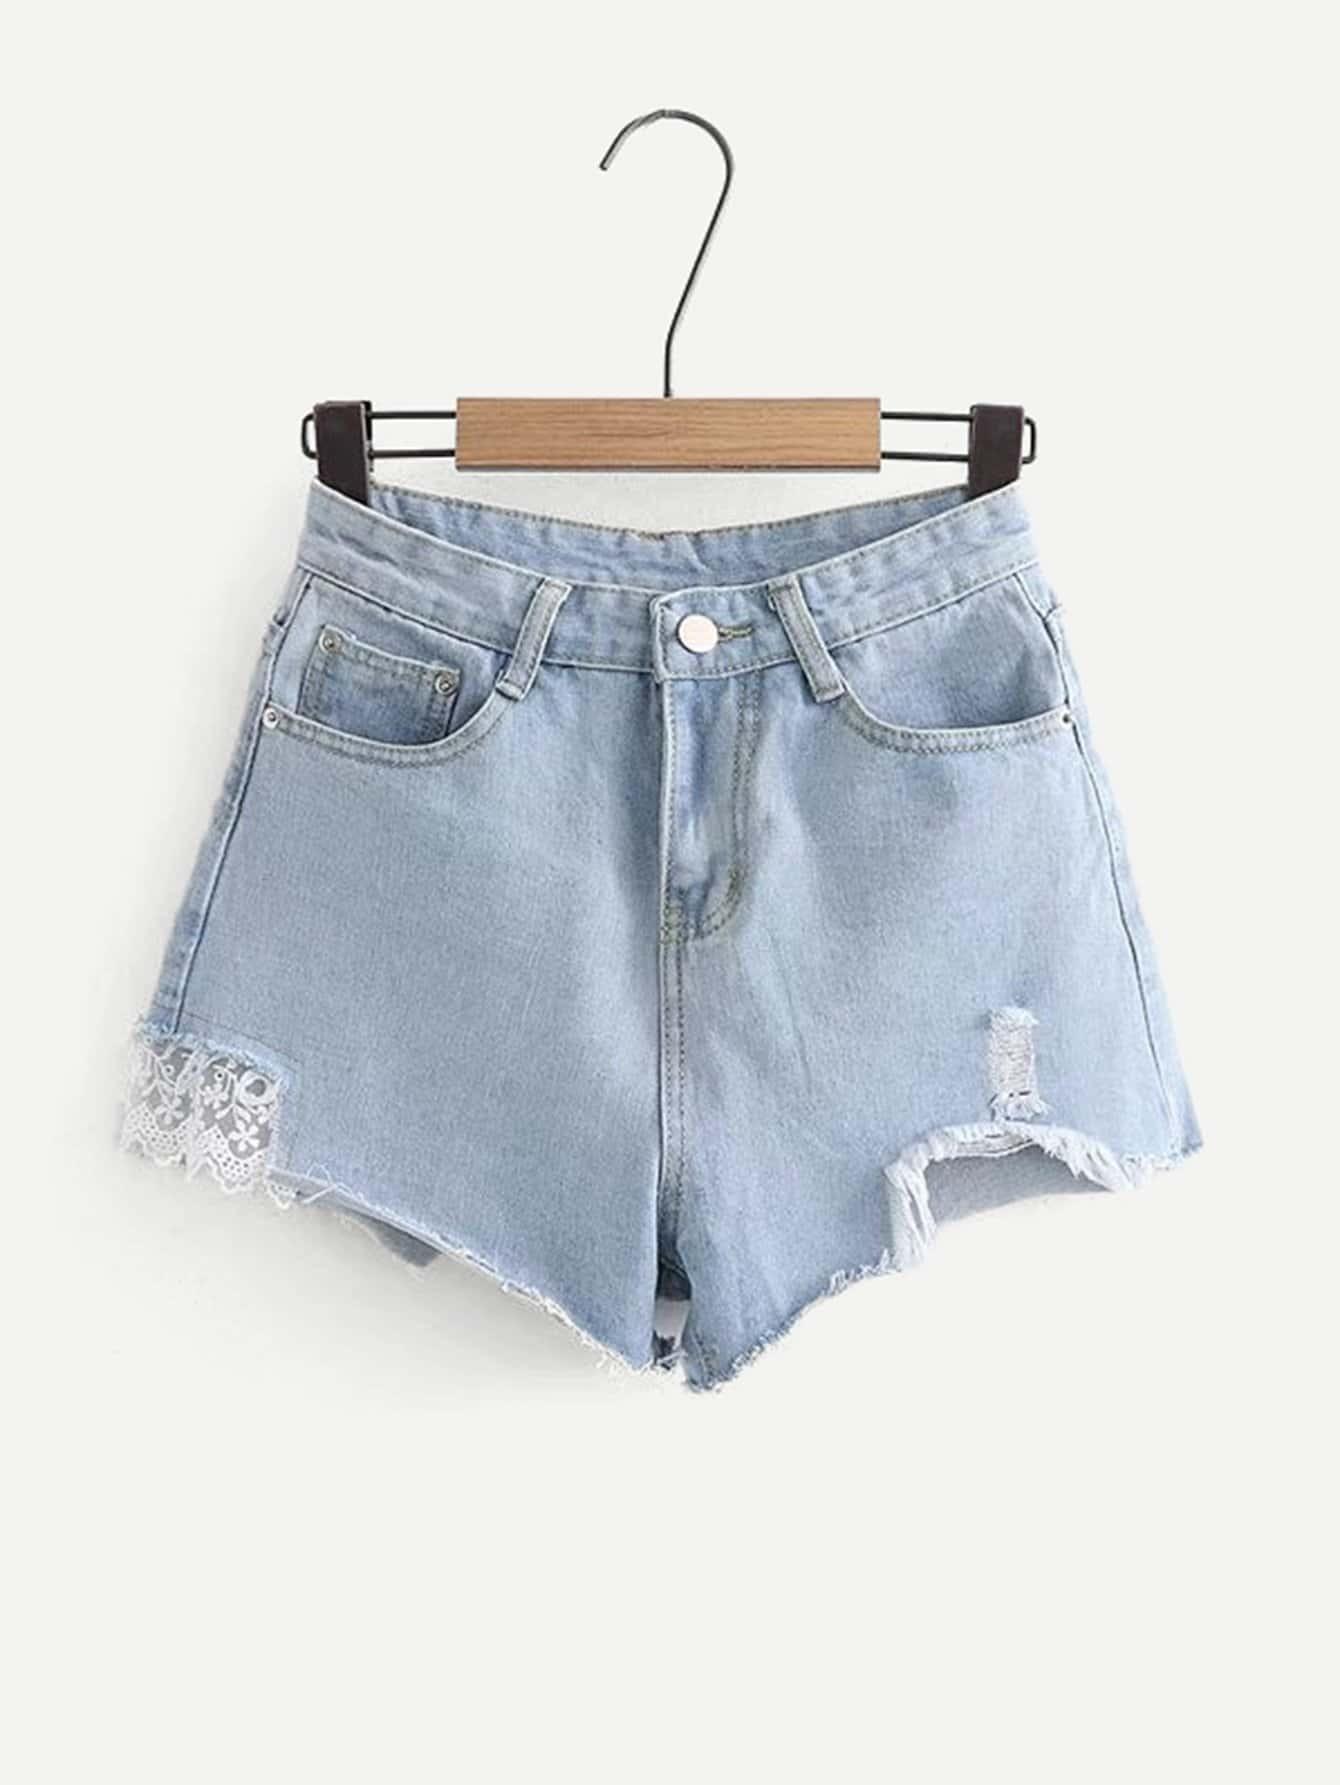 Contrast Lace Raw Hem Denim Shorts lace hem shorts